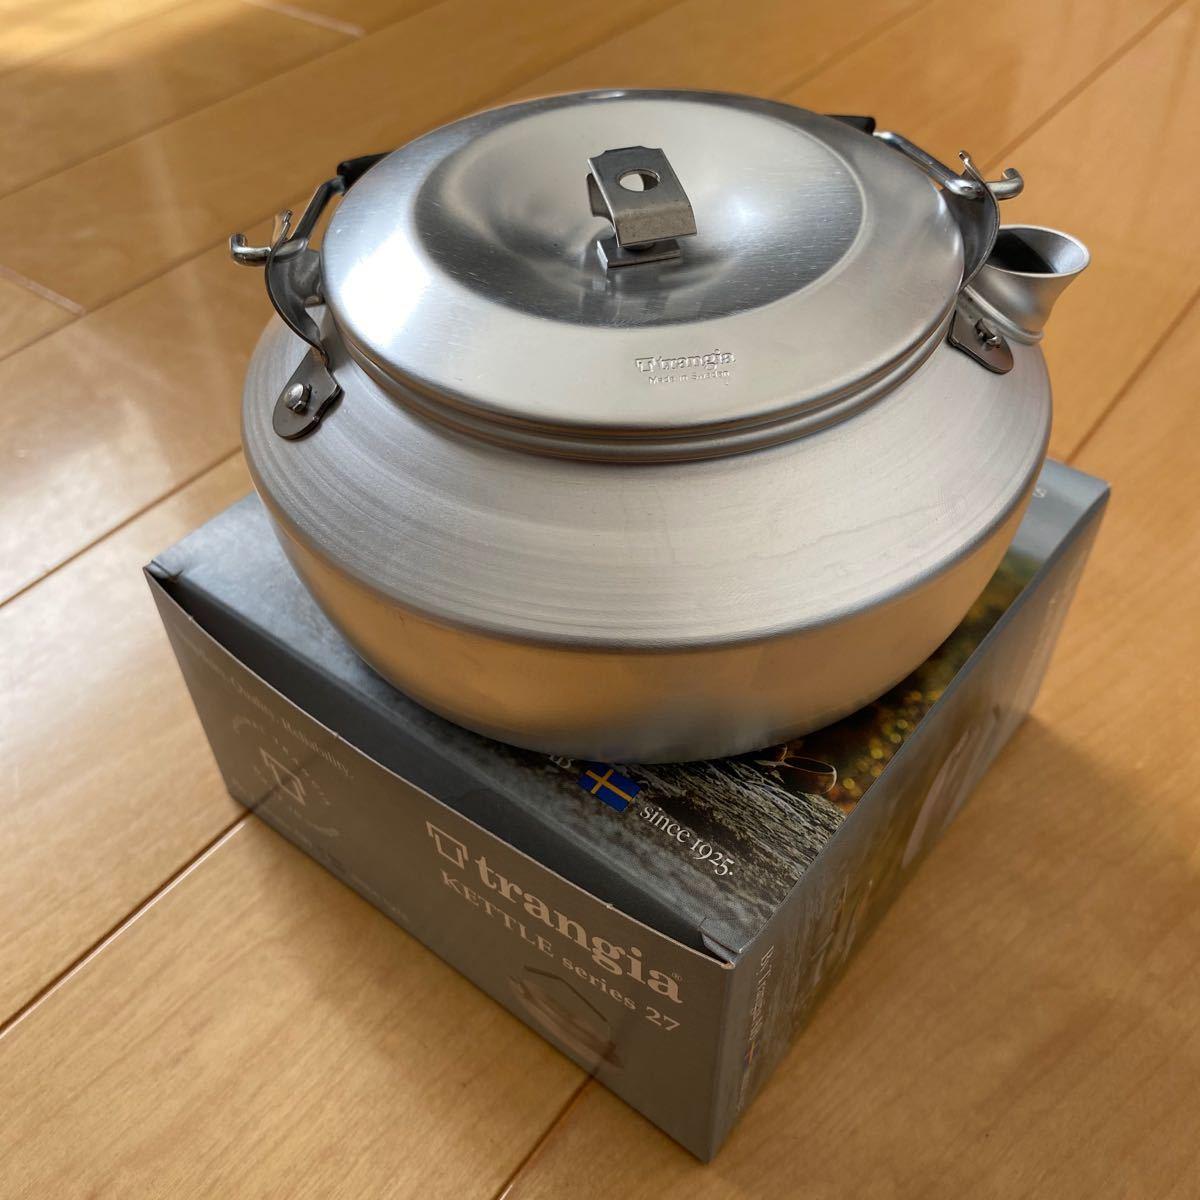 trangia トランギア ケトル 0.6リットル(新品未使用)